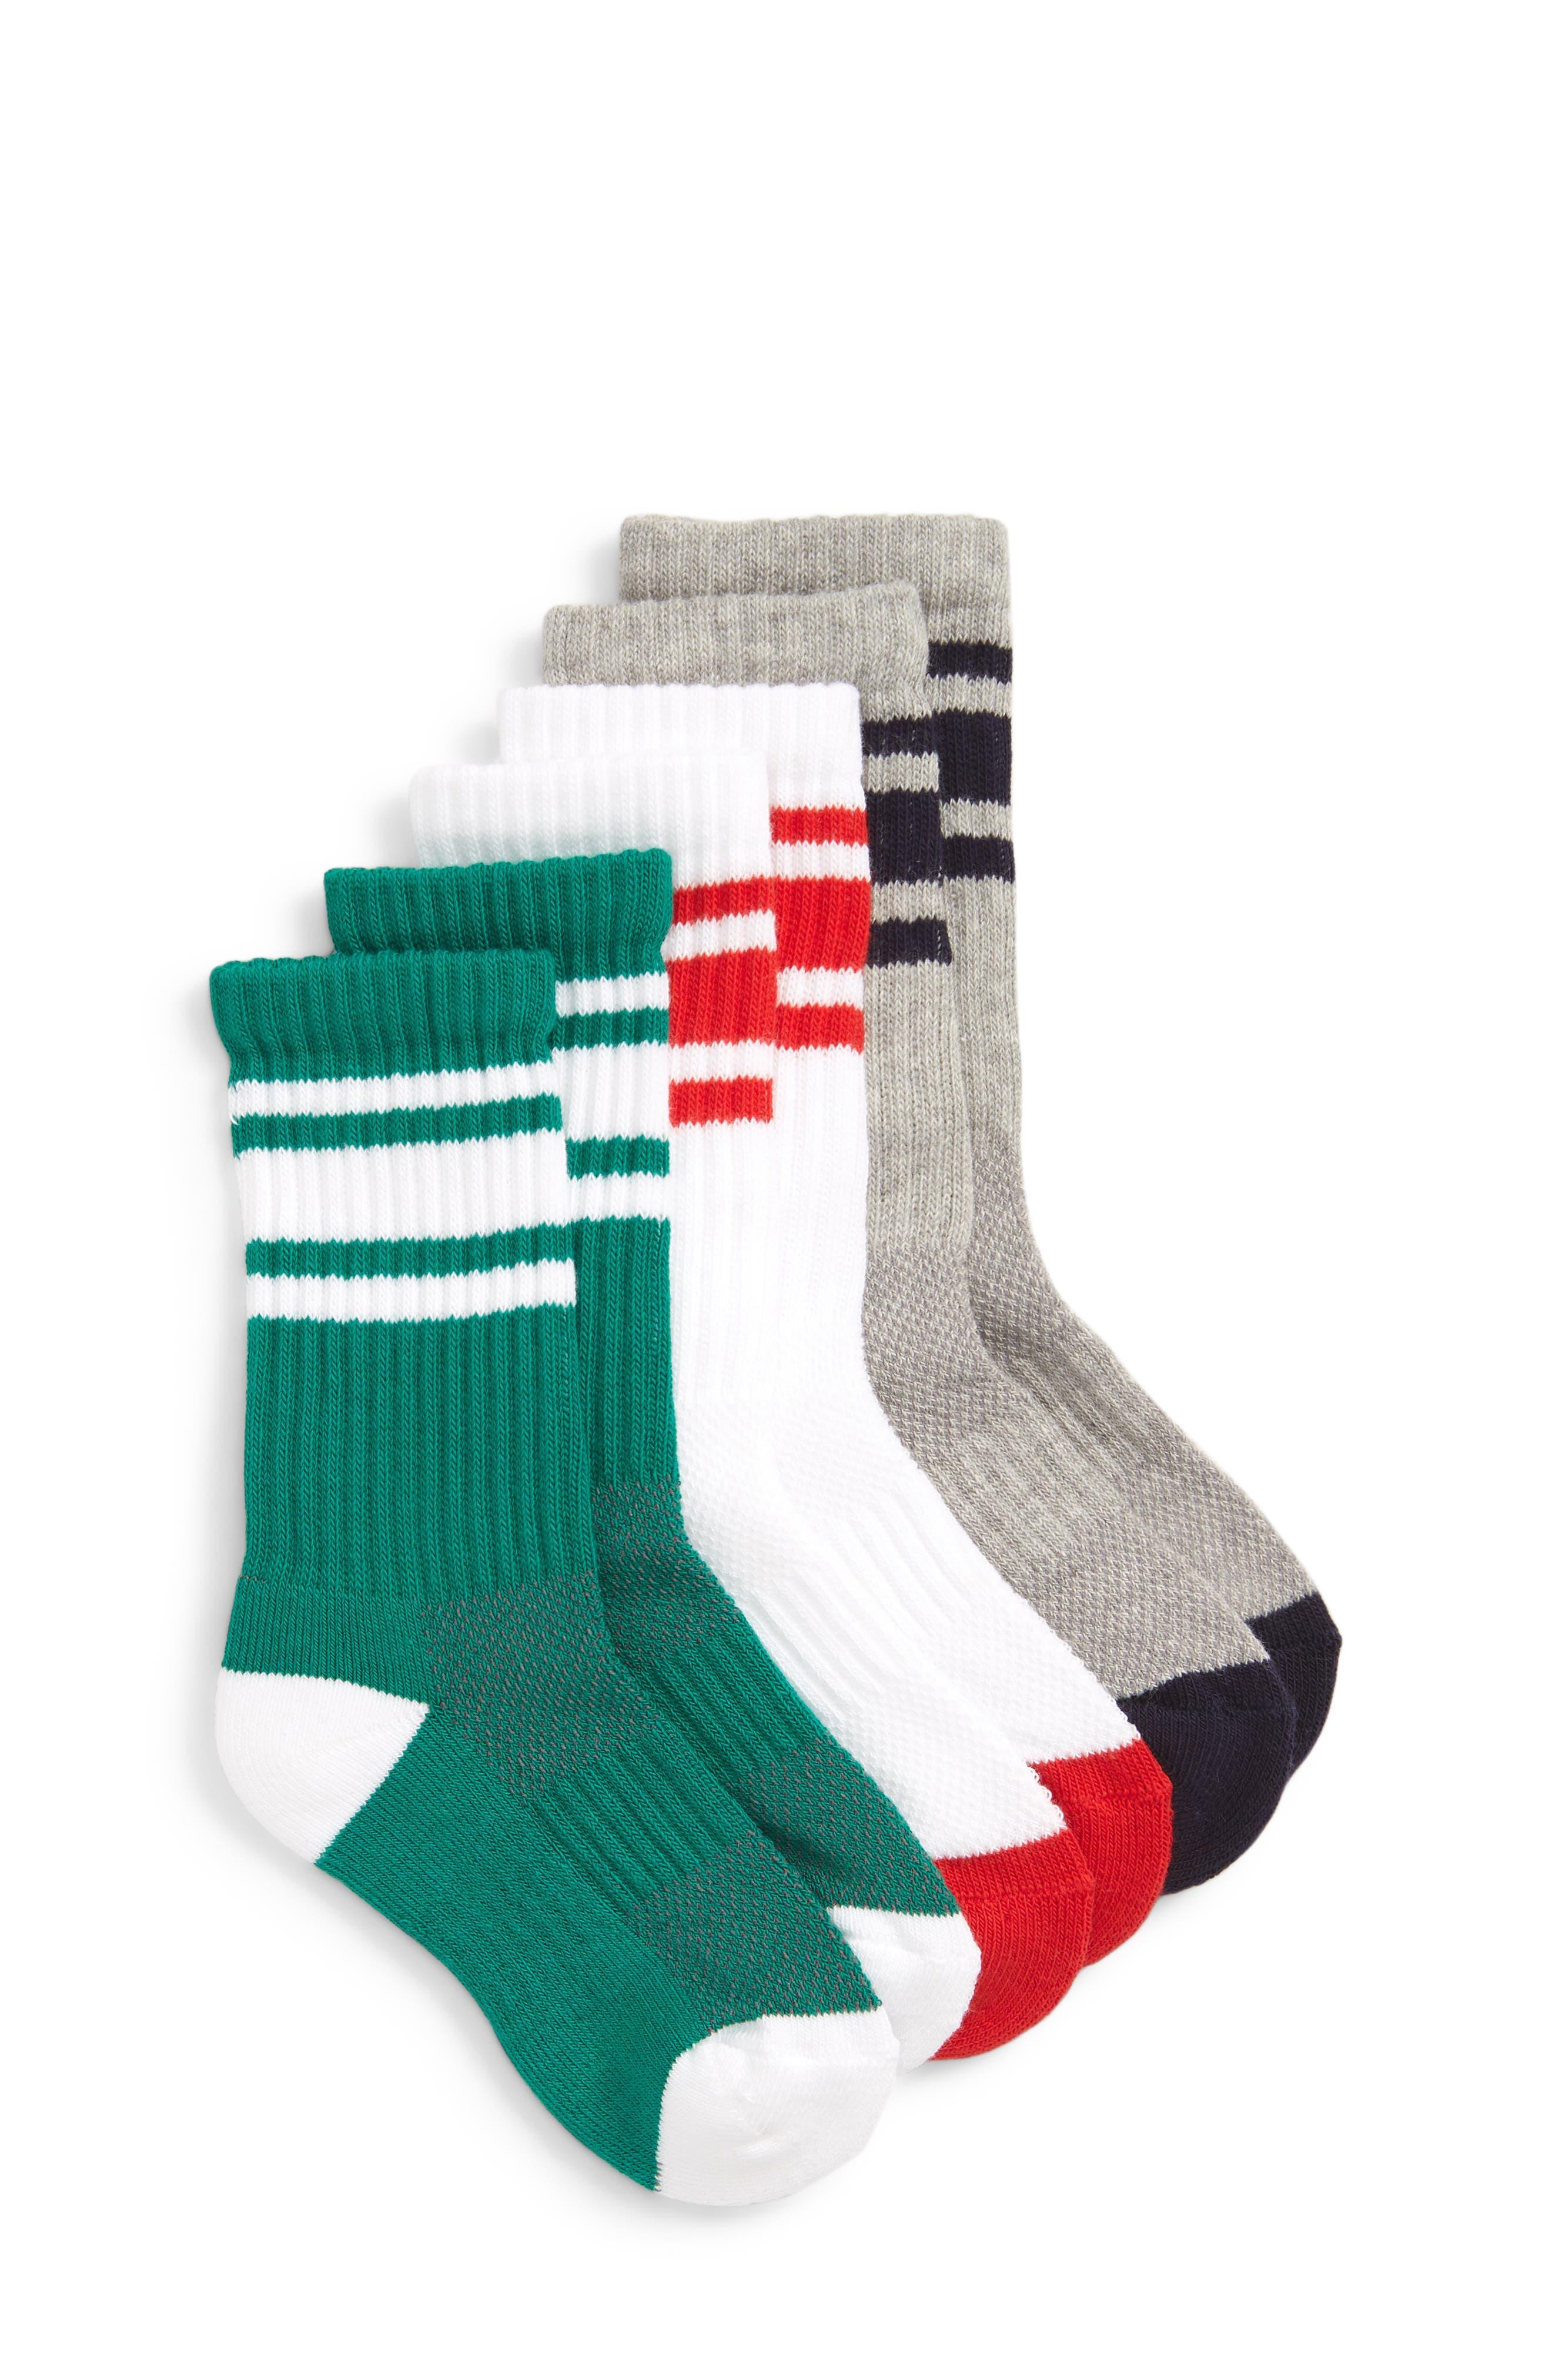 TUCKER + TATE,                             3-Pack Tube Socks,                             Main thumbnail 1, color,                             420